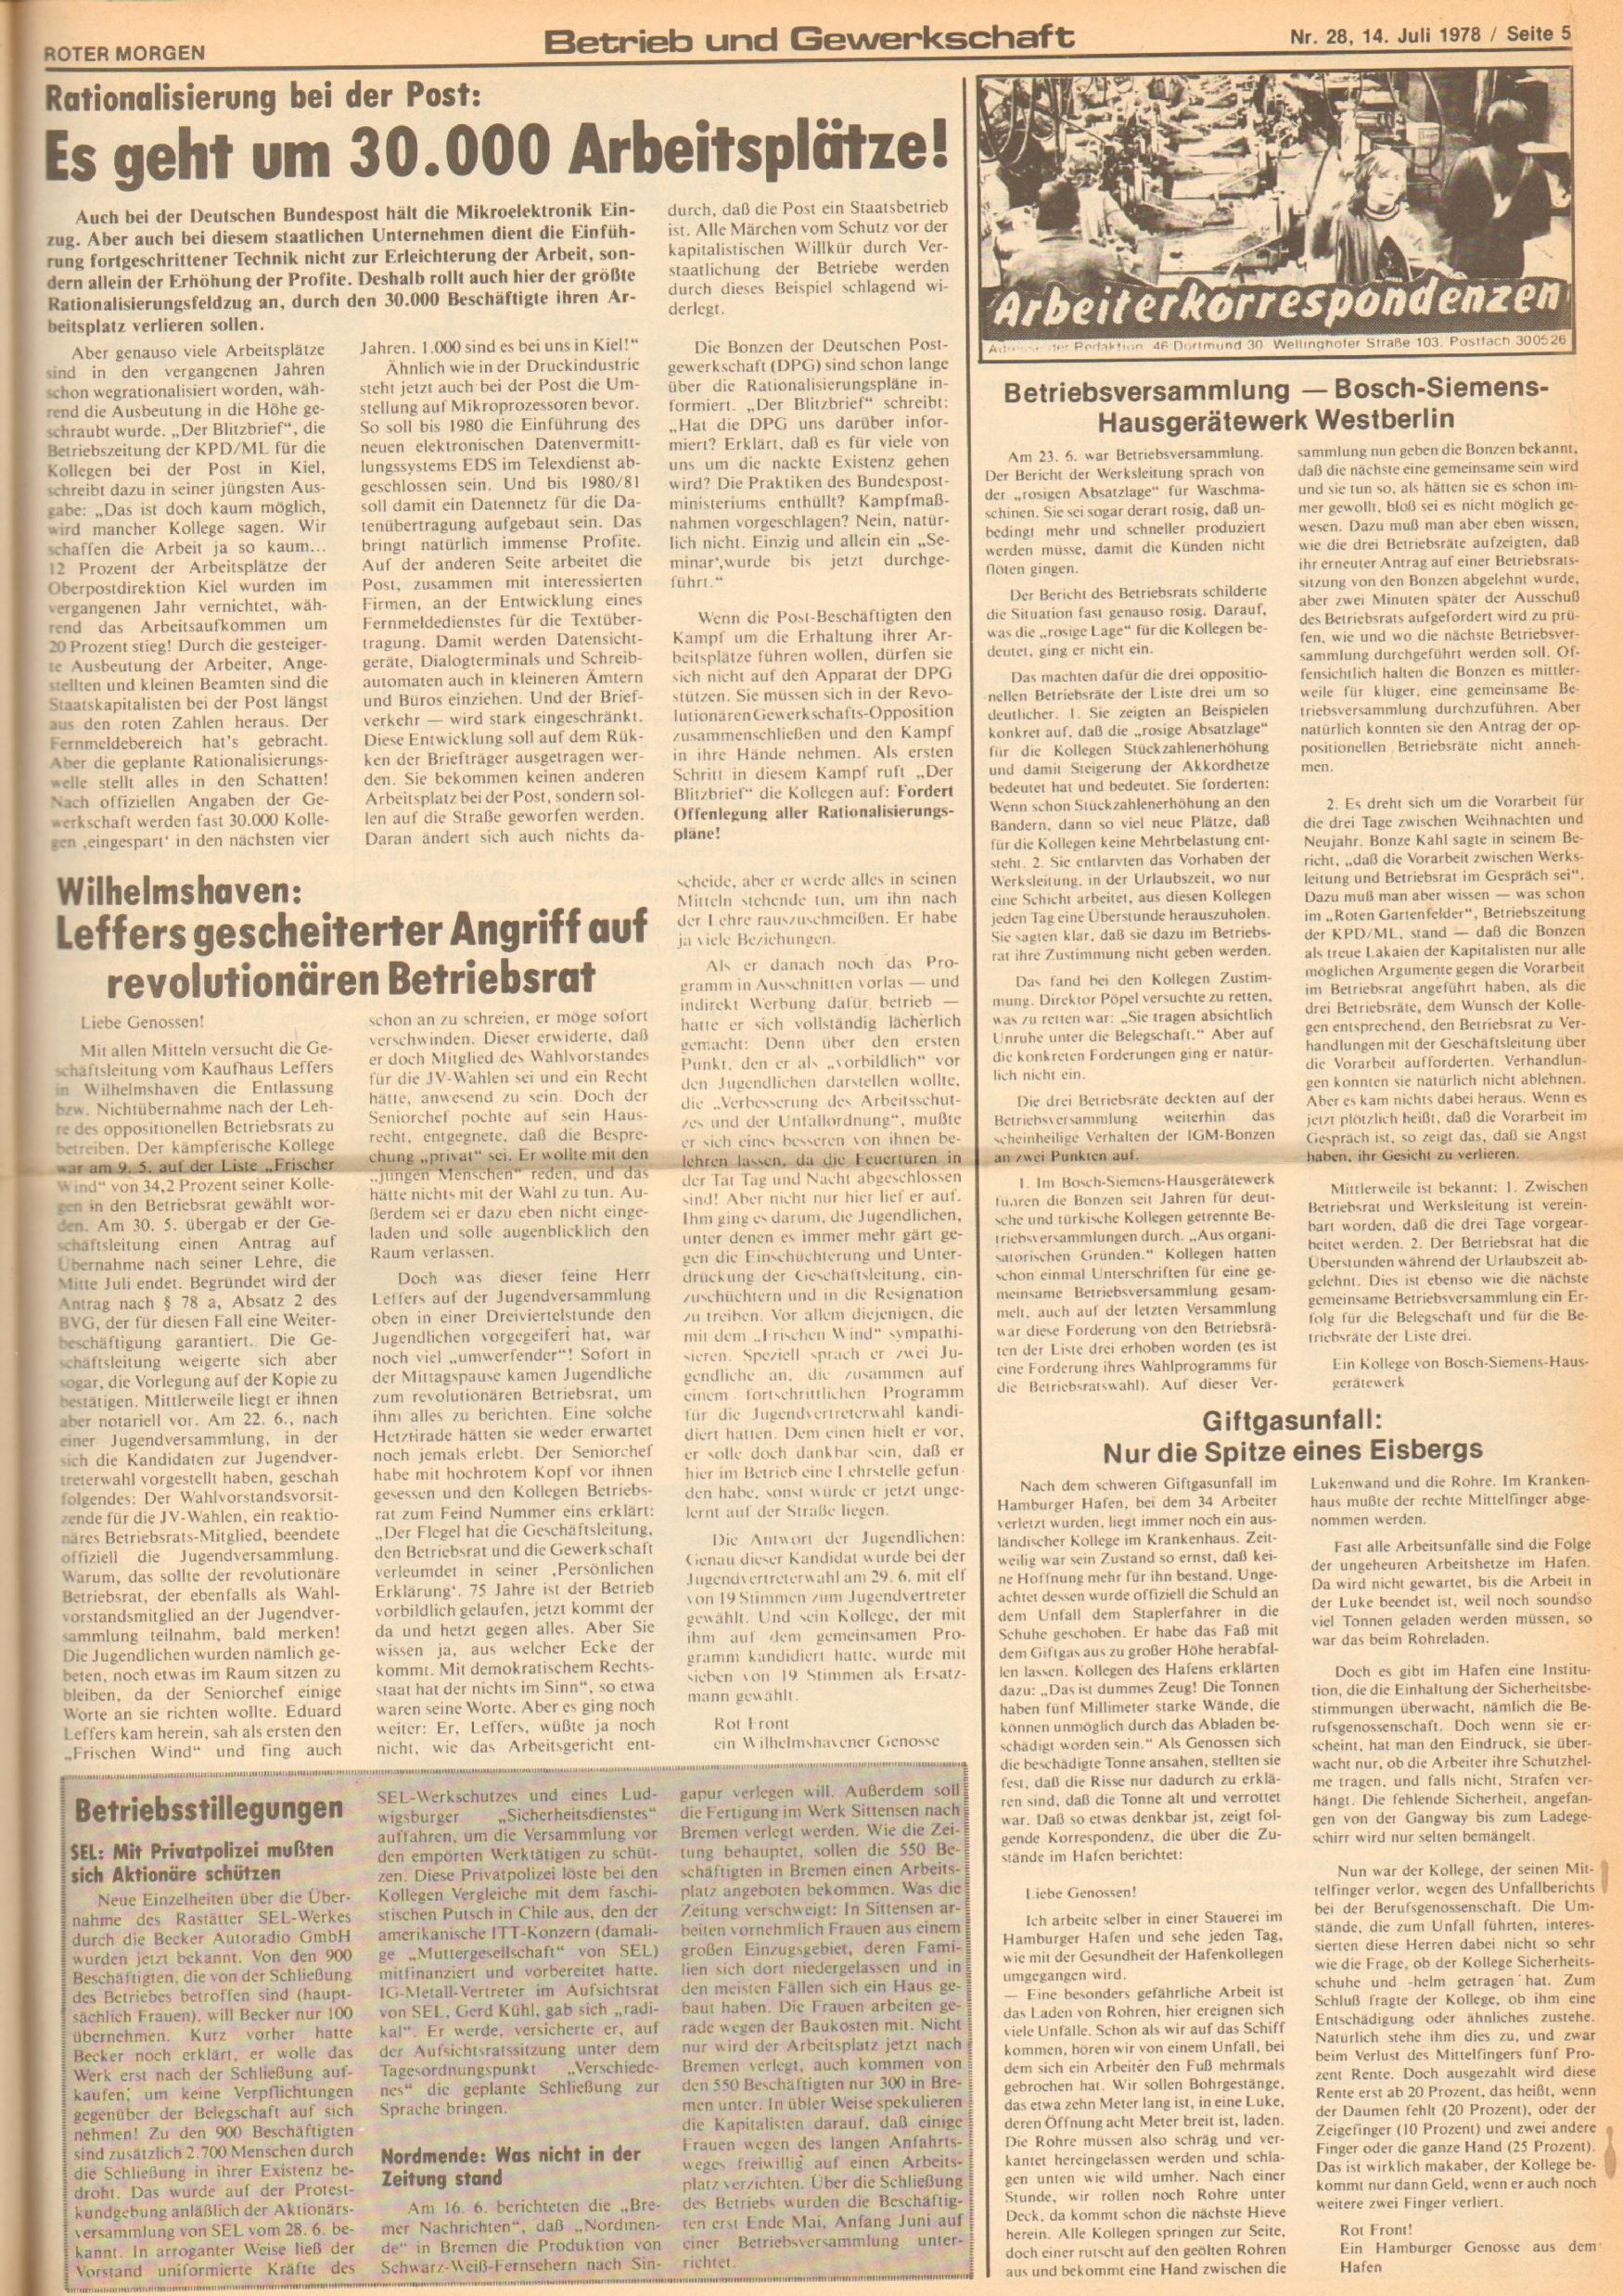 Roter Morgen, 12. Jg., 16. Juli 1978, Nr. 28, Seite 5